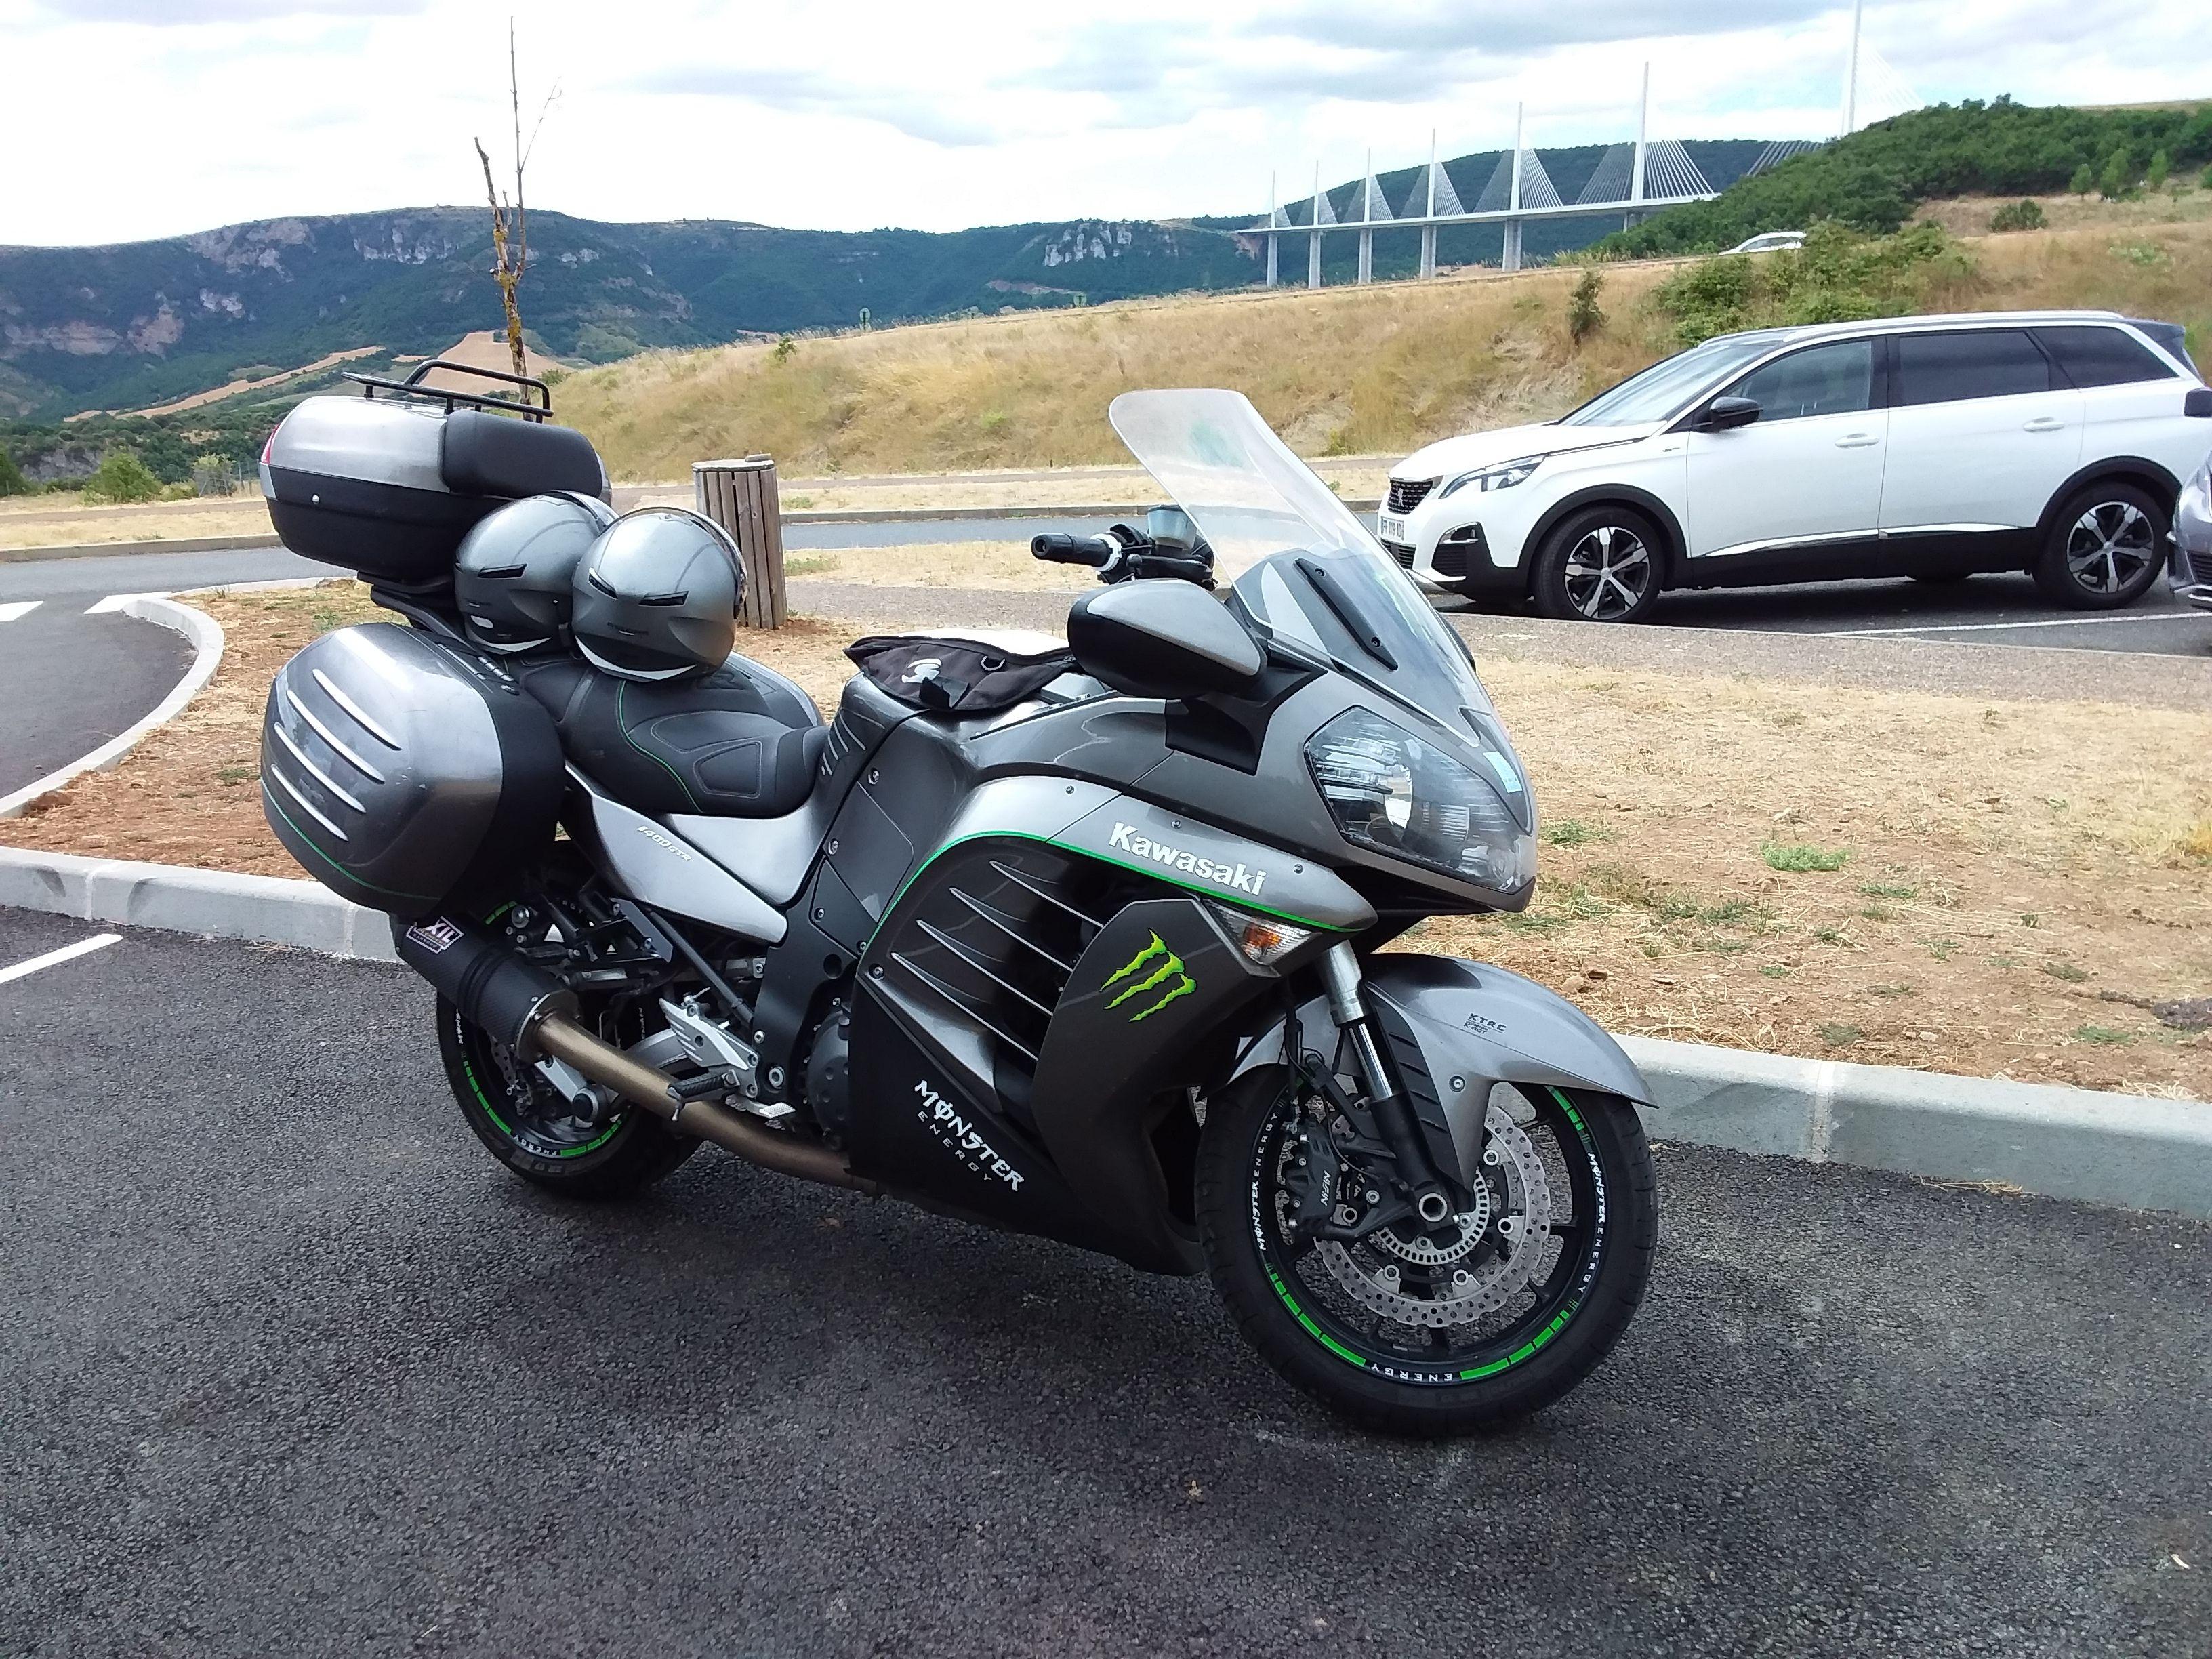 Kawasaki 1400 Gtr De 2014 Kawasaki Motorcycle Vehicles